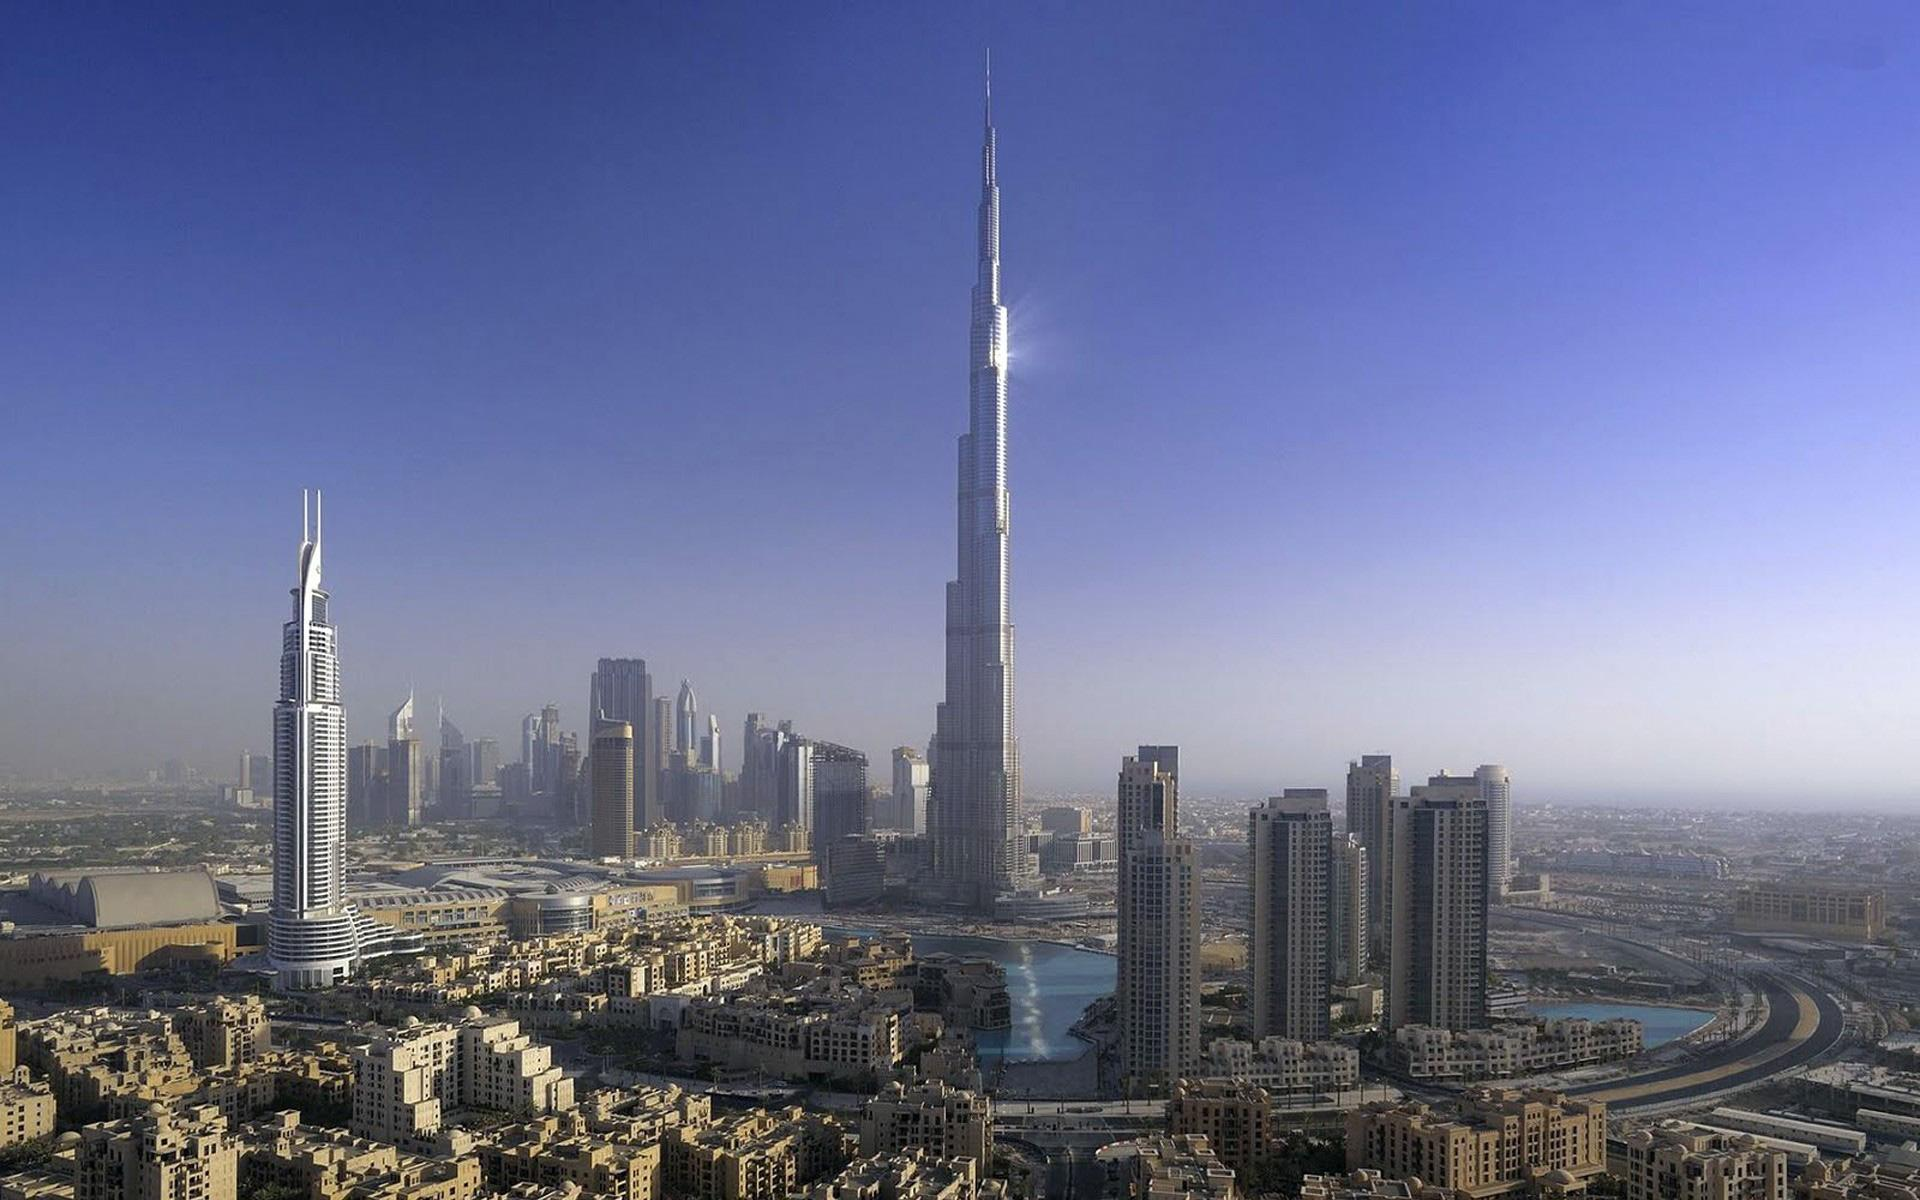 Дубай башня бурдж халифа высота квартиру в тайланде купить авито